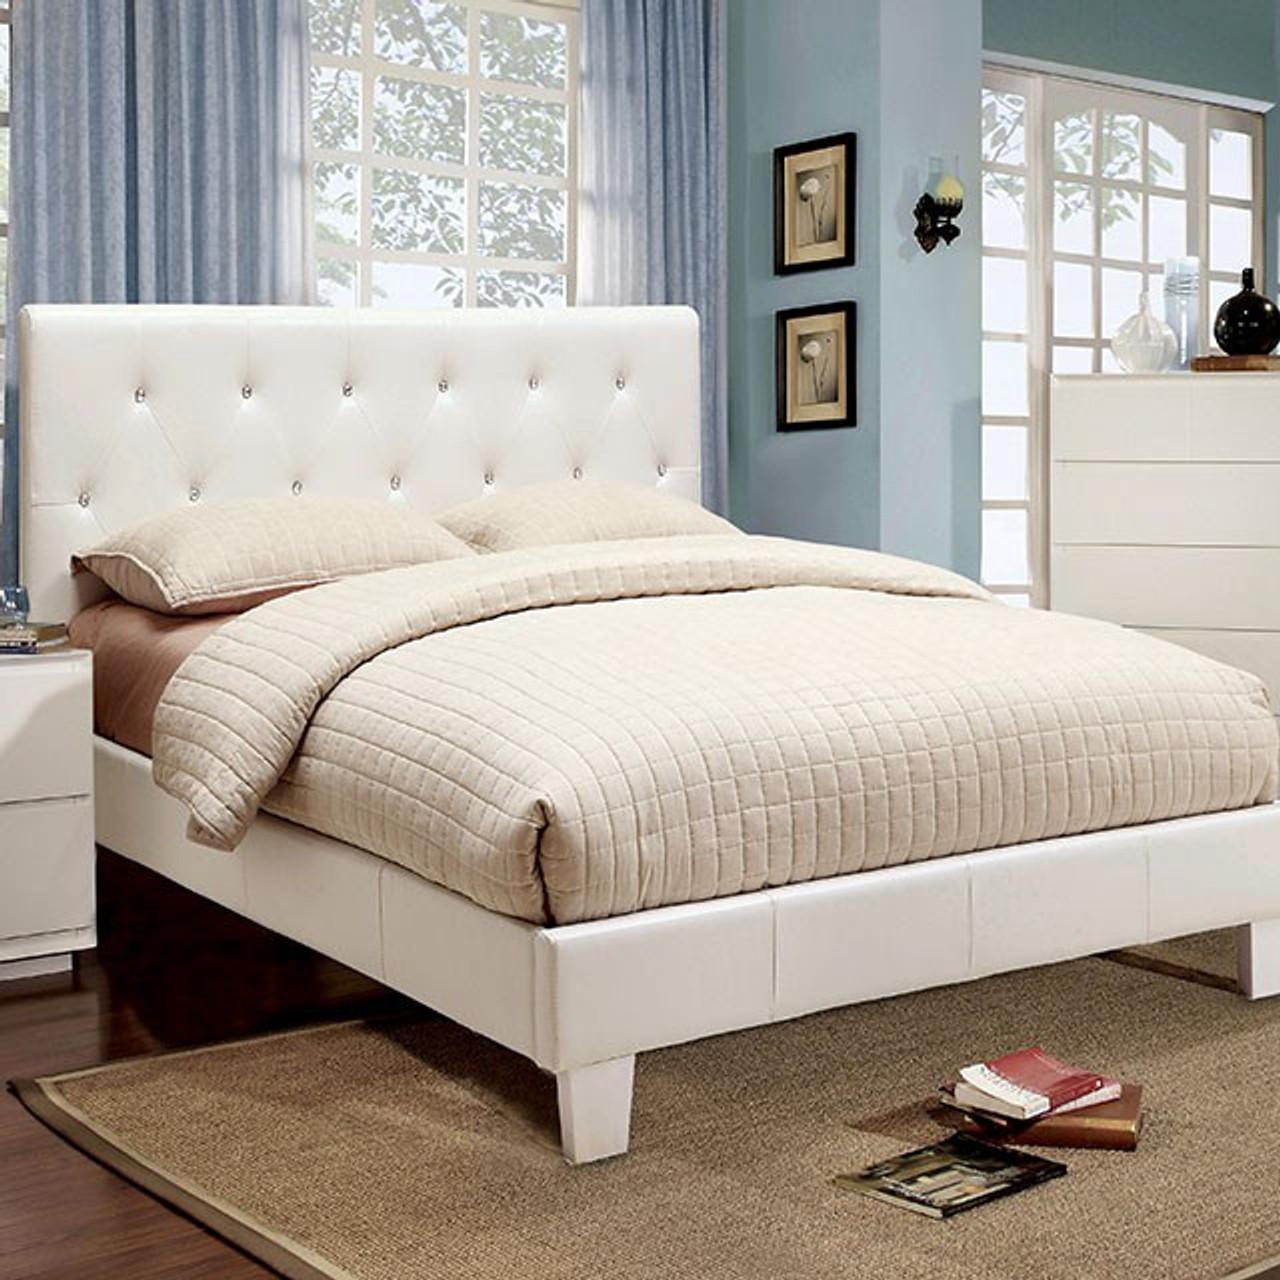 Remy Eastern King Bedroom Set- White